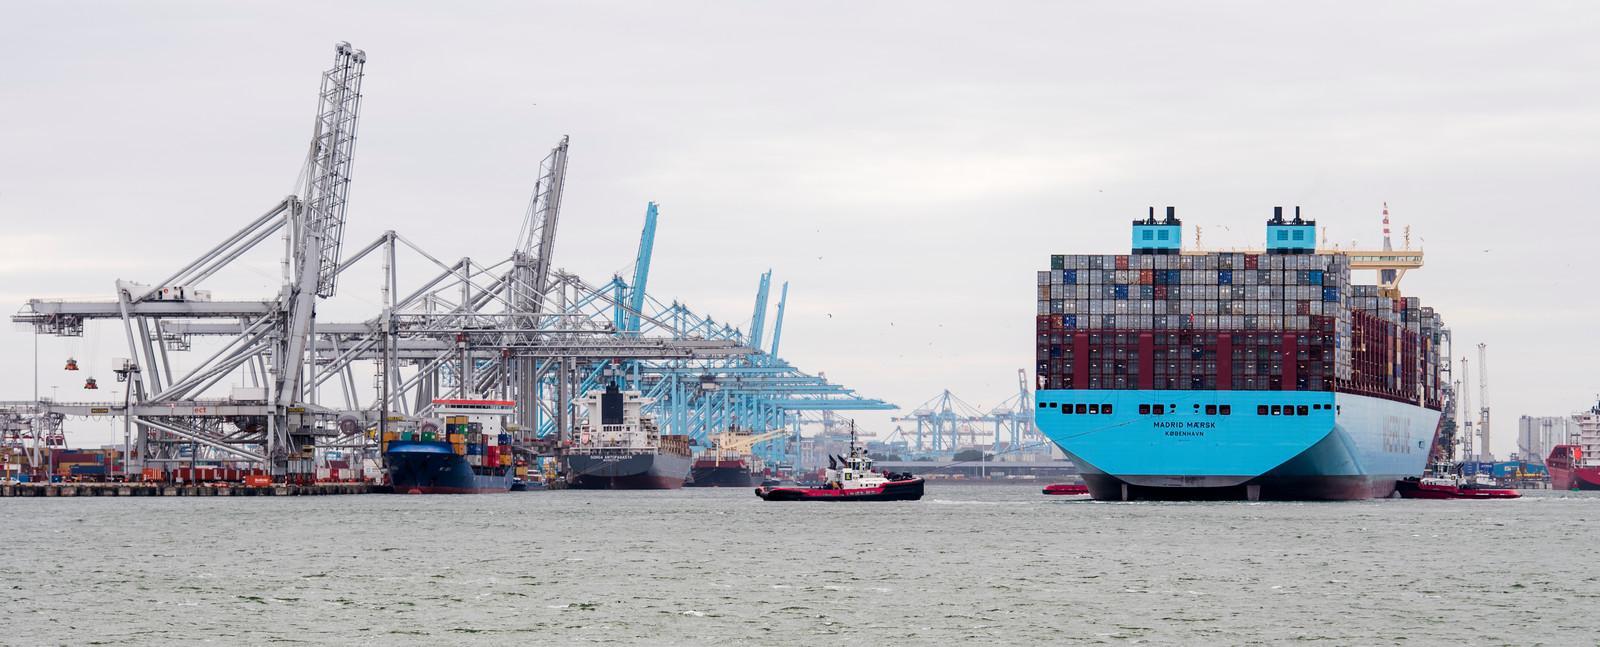 OESO: EU, maak vuist tegen samenwerking grote reders | Foto